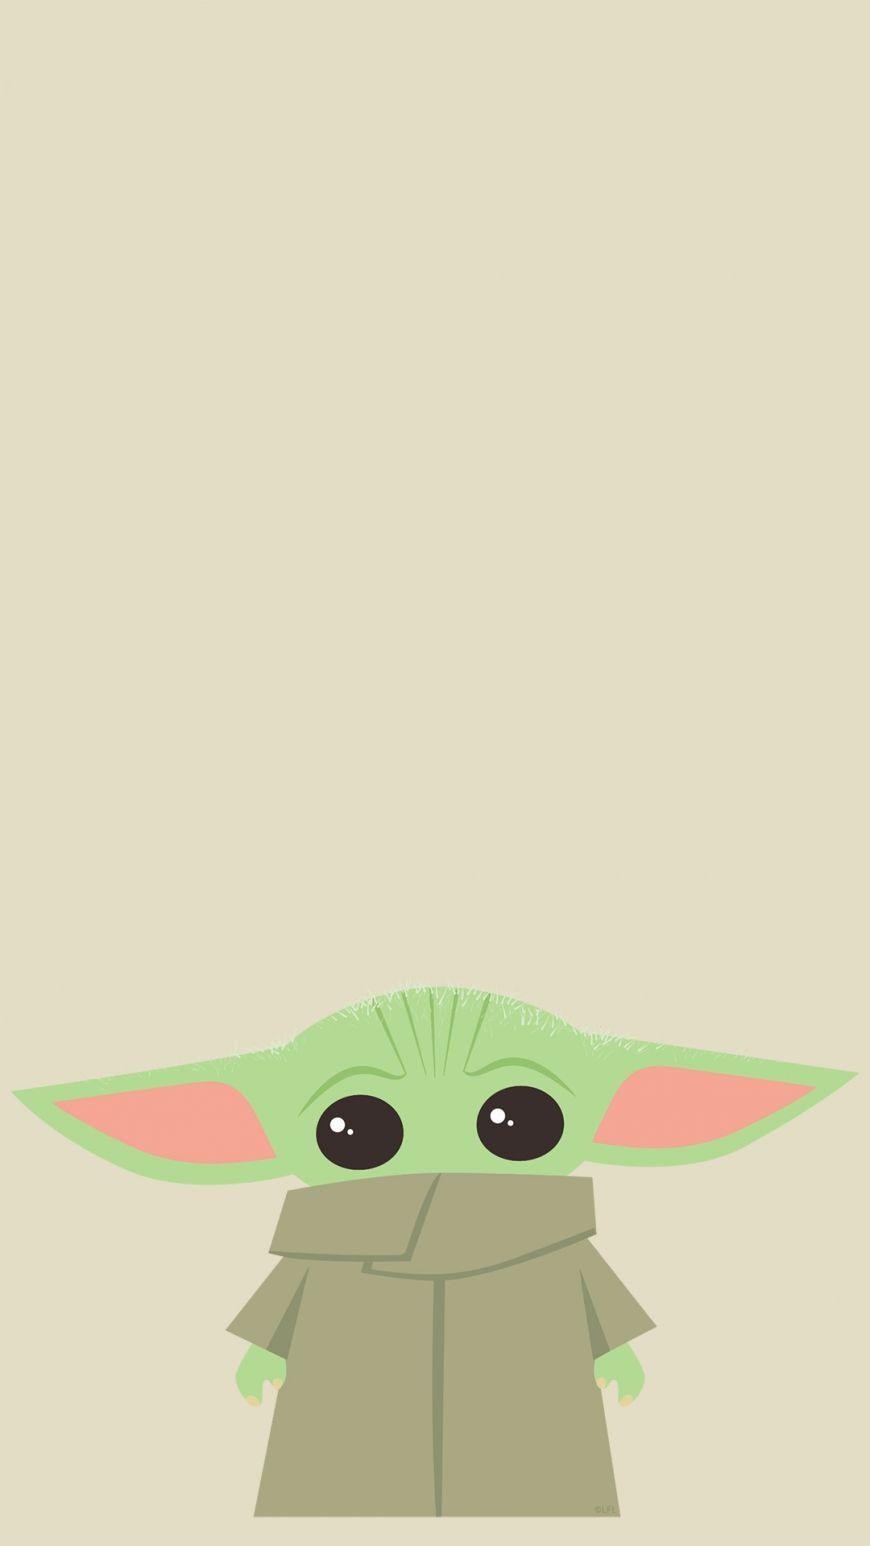 Cute Baby Yoda Wallpaper Yoda Wallpaper Cute Patterns Wallpaper Cute Wallpapers